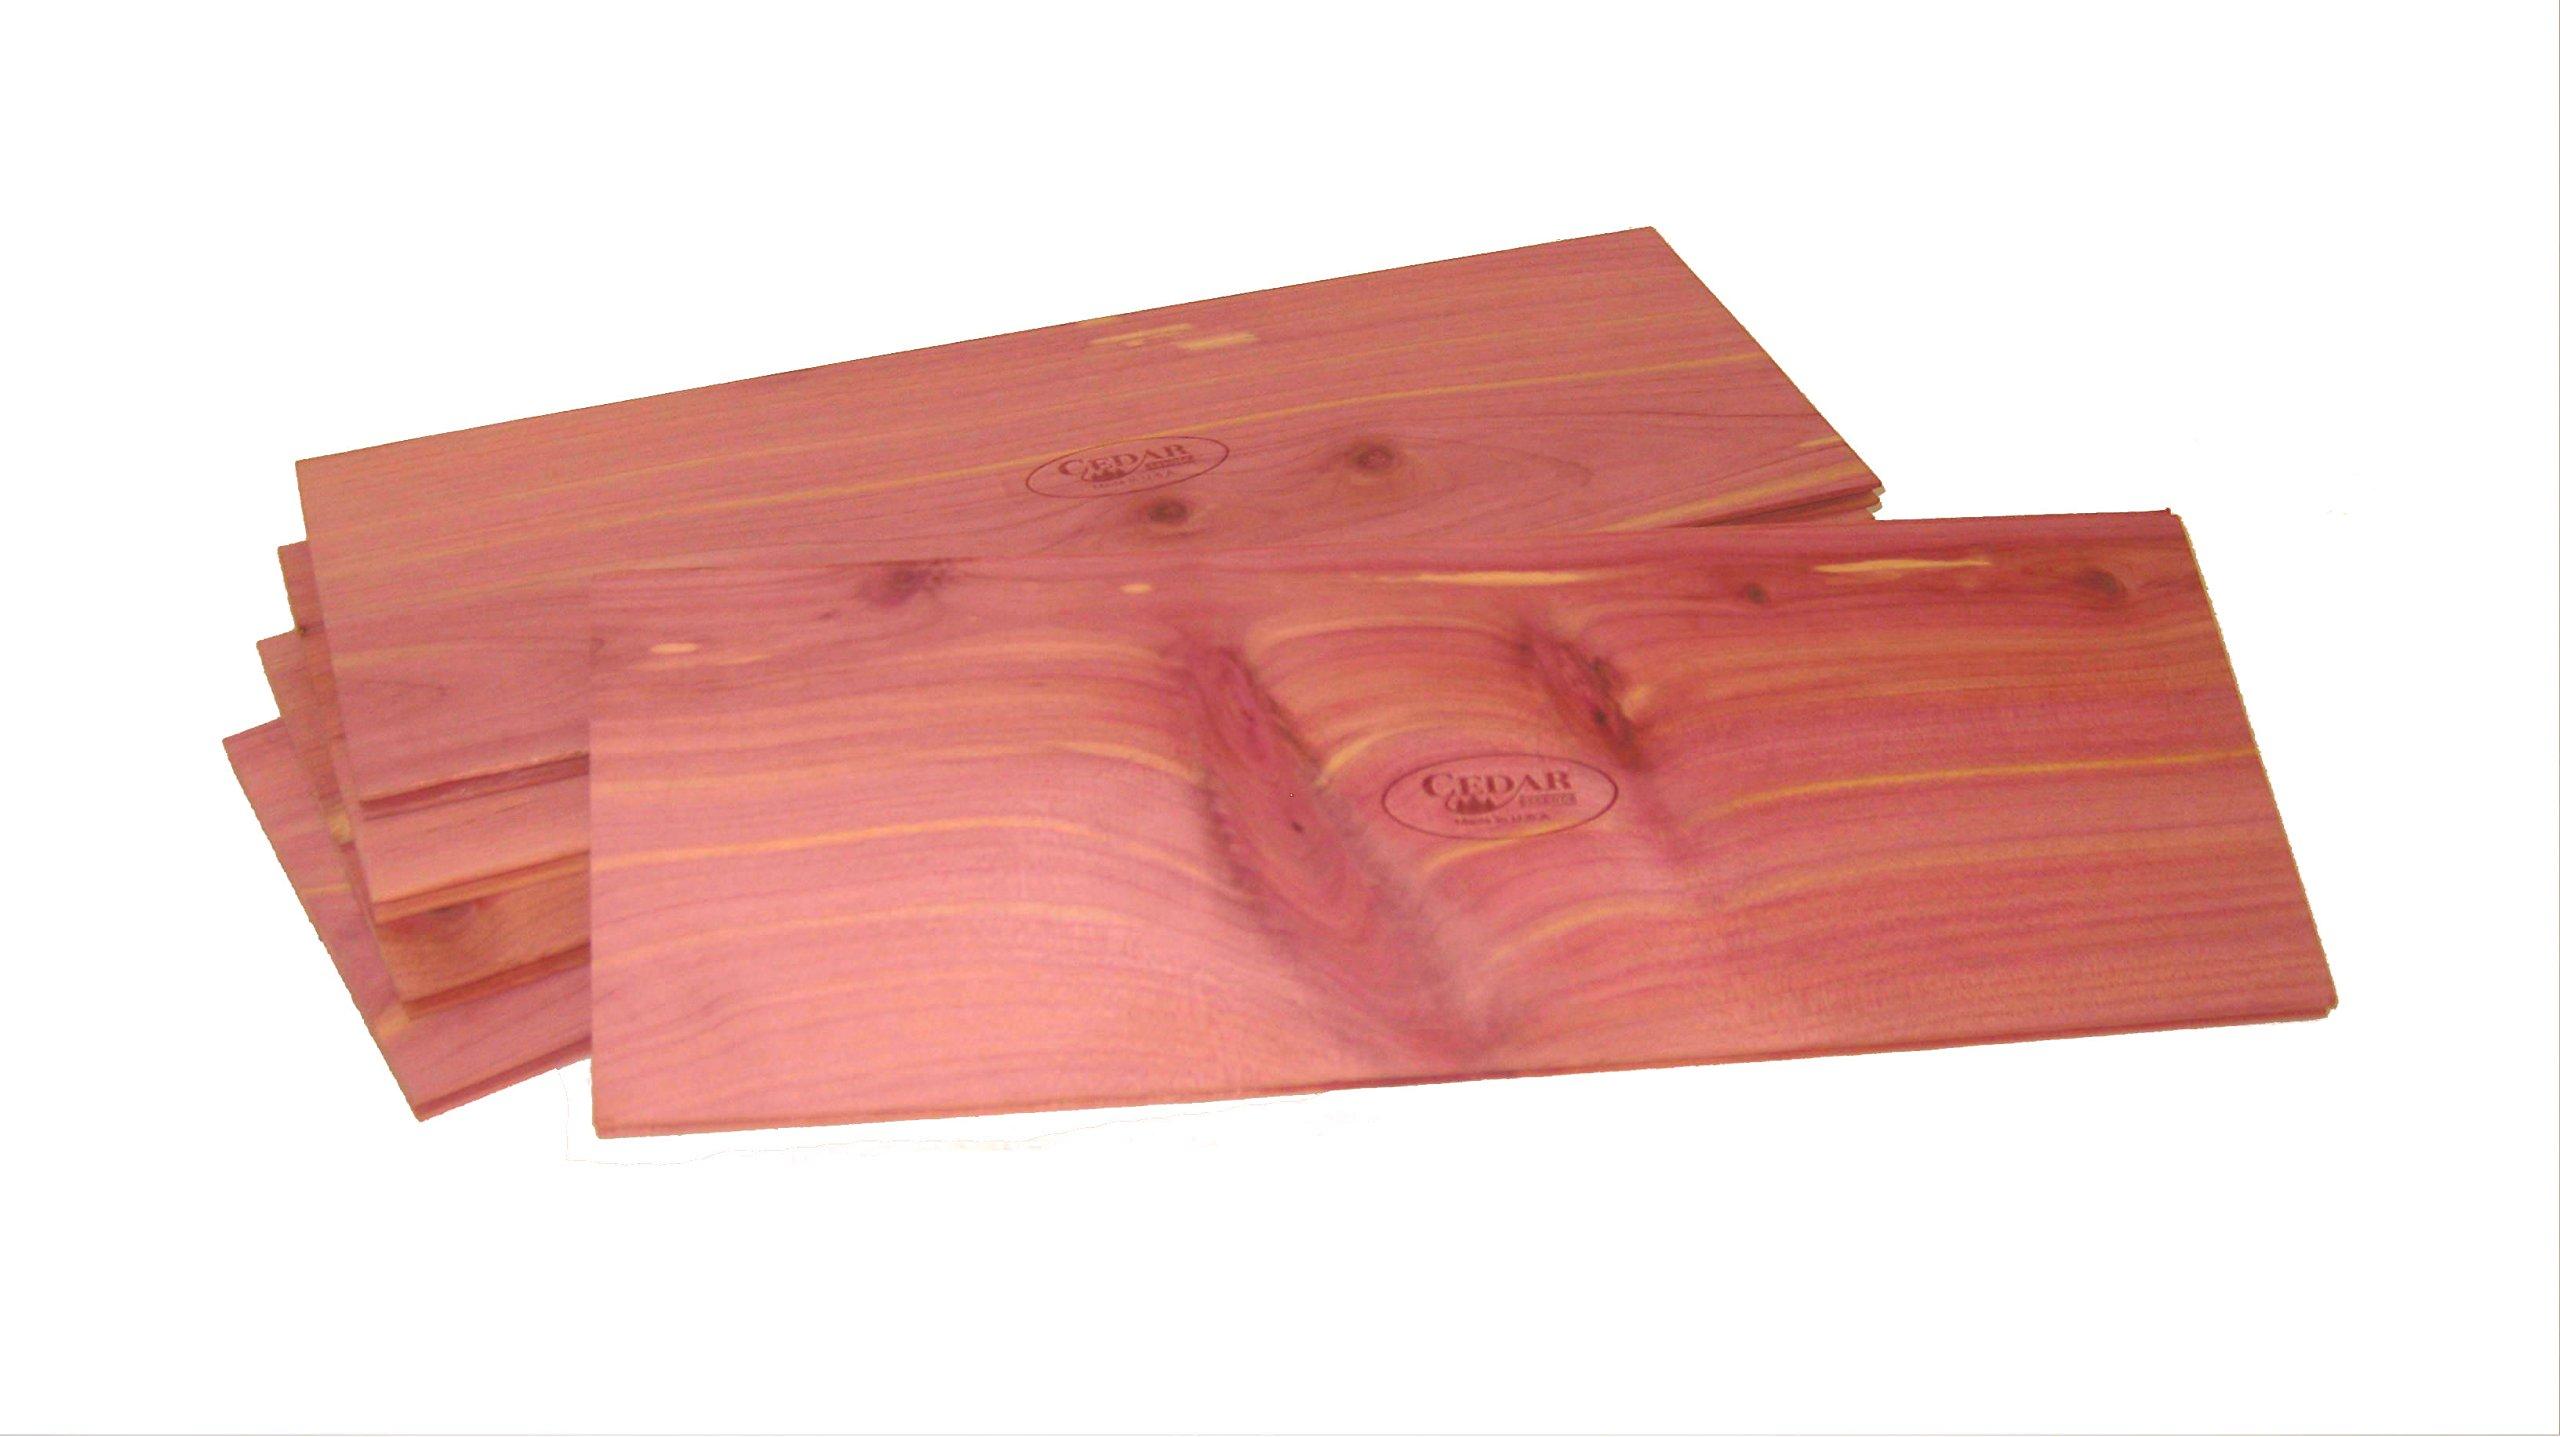 Cedar Essence Tongue and Groove Cedar Drawer Liner Each Plank is 12''L x 4.25''W x 1/4'' Thick. MADE IN THE U.S.A. SET OF 5.